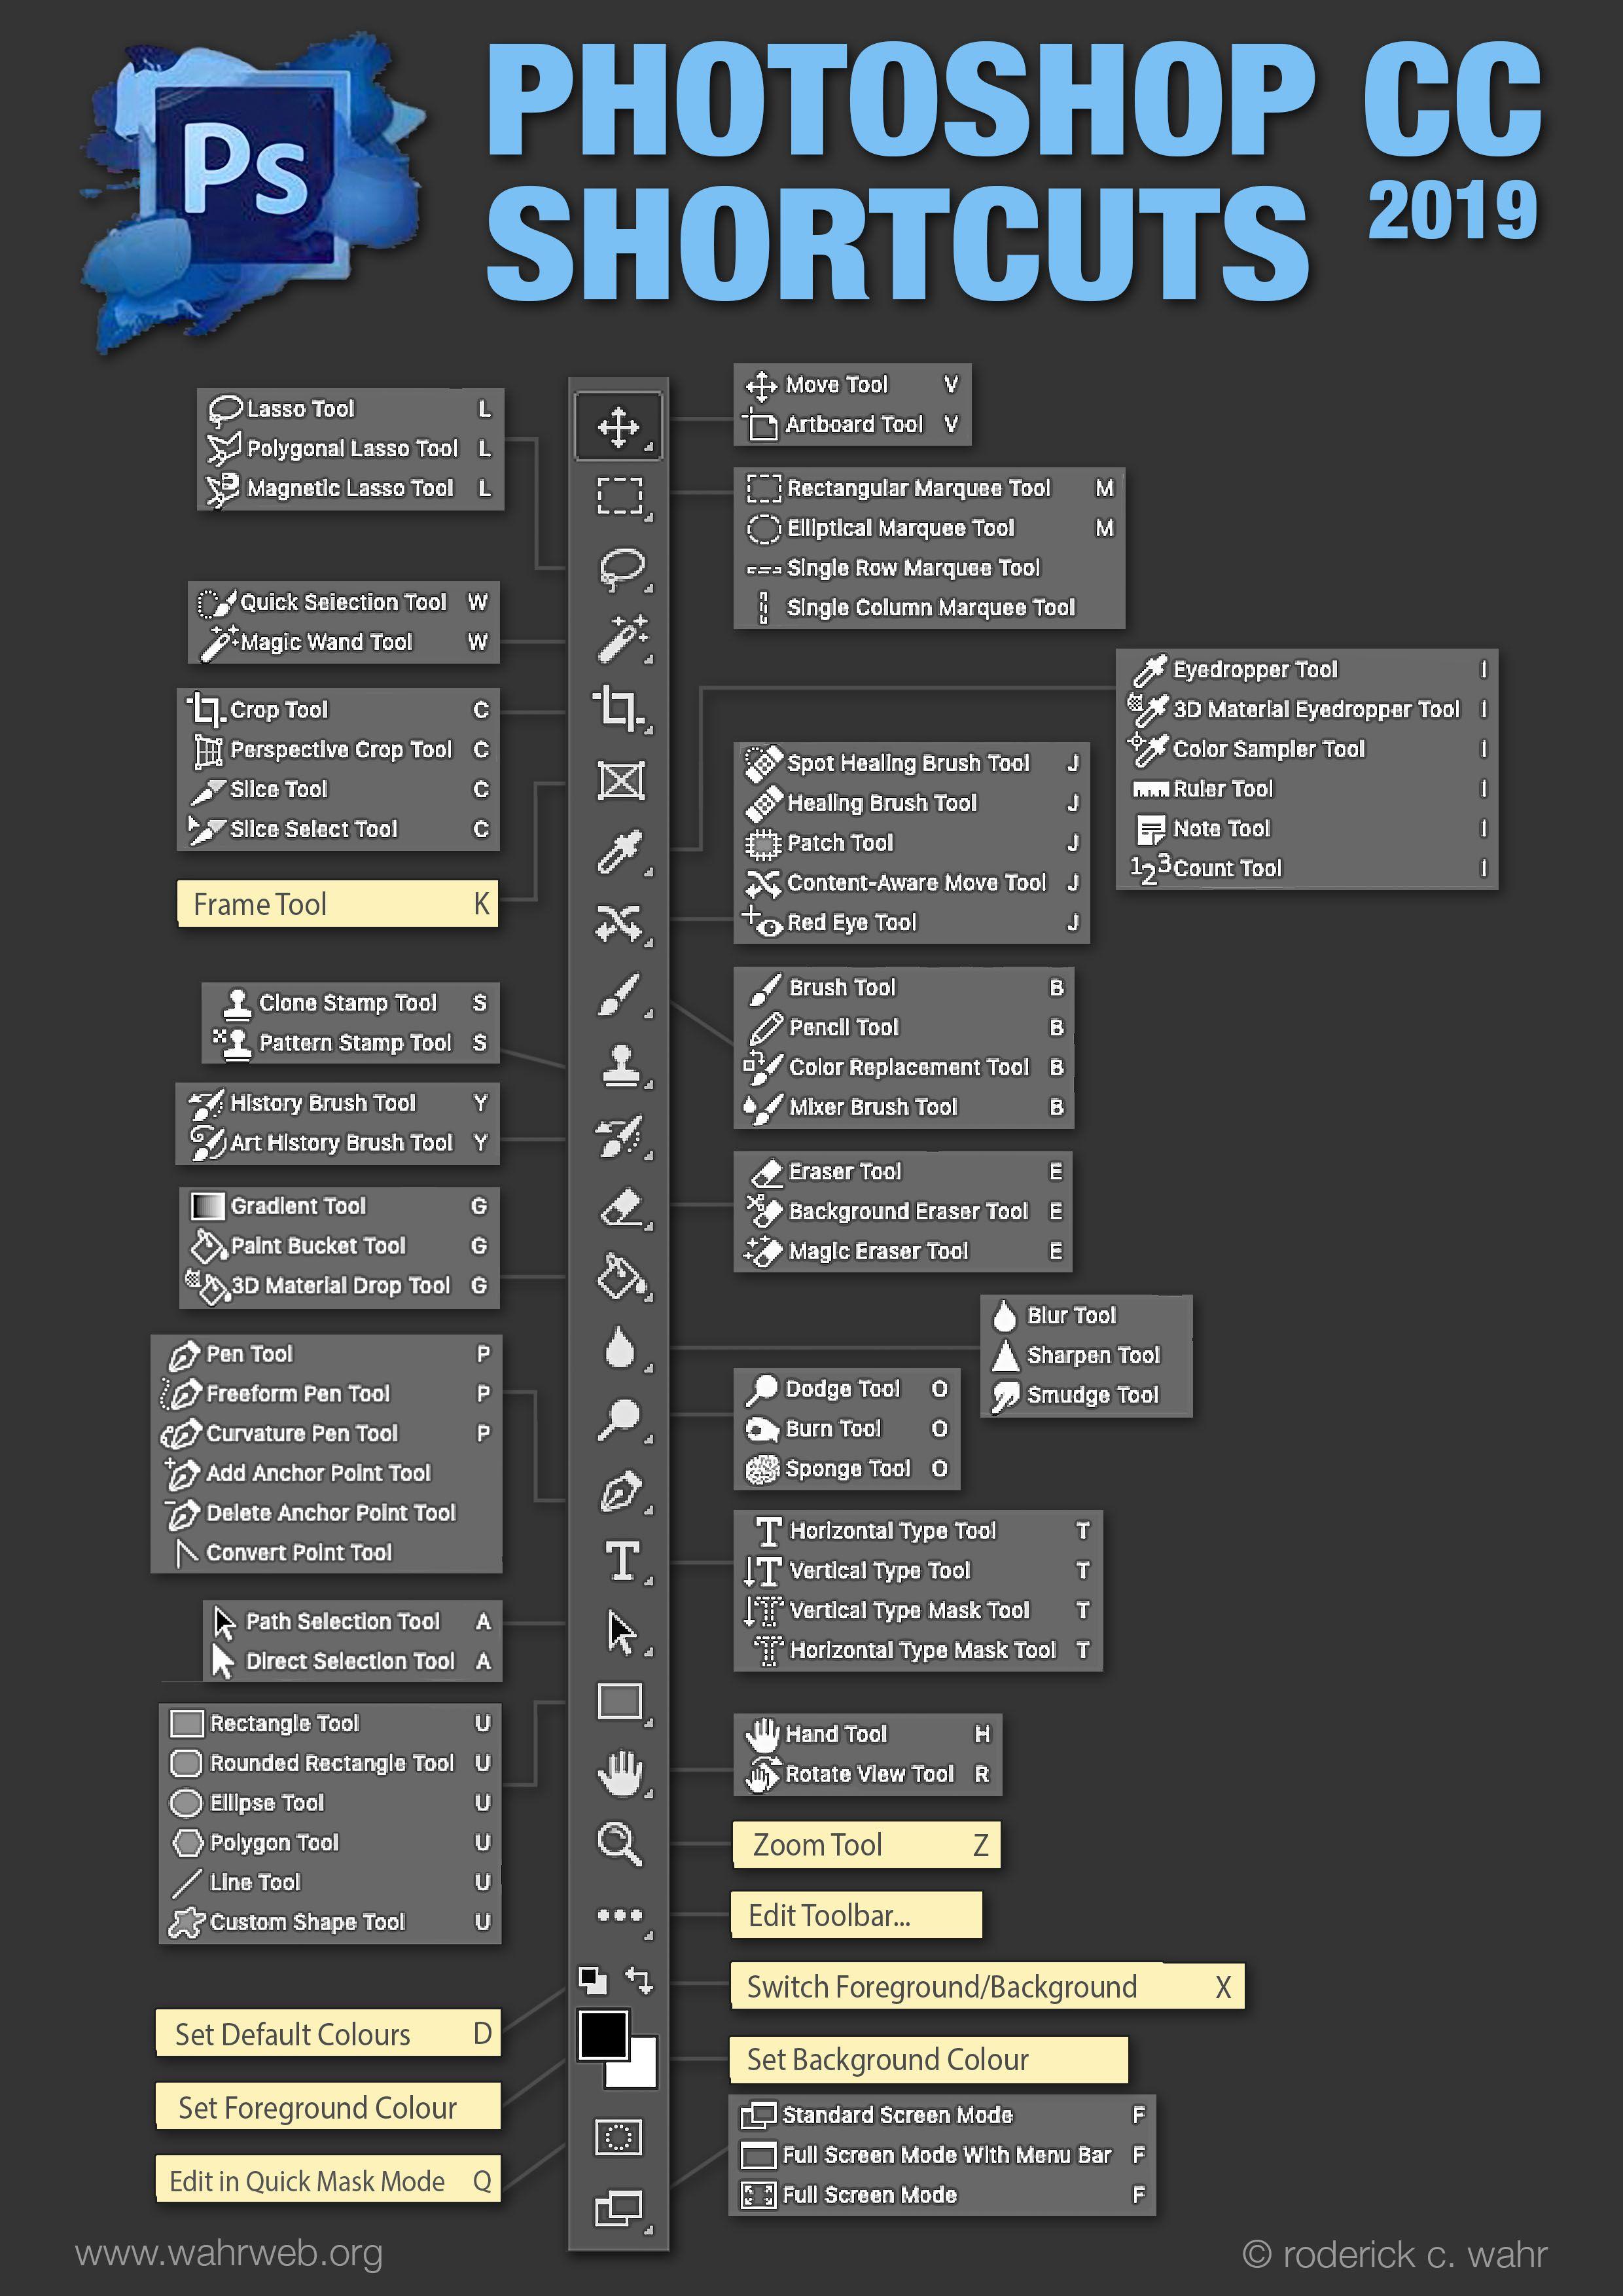 Photoshop Cc 2019 Toolbar Shortcuts Photoshop Basics Photoshop Poster Tutorial Photoshop Shortcut